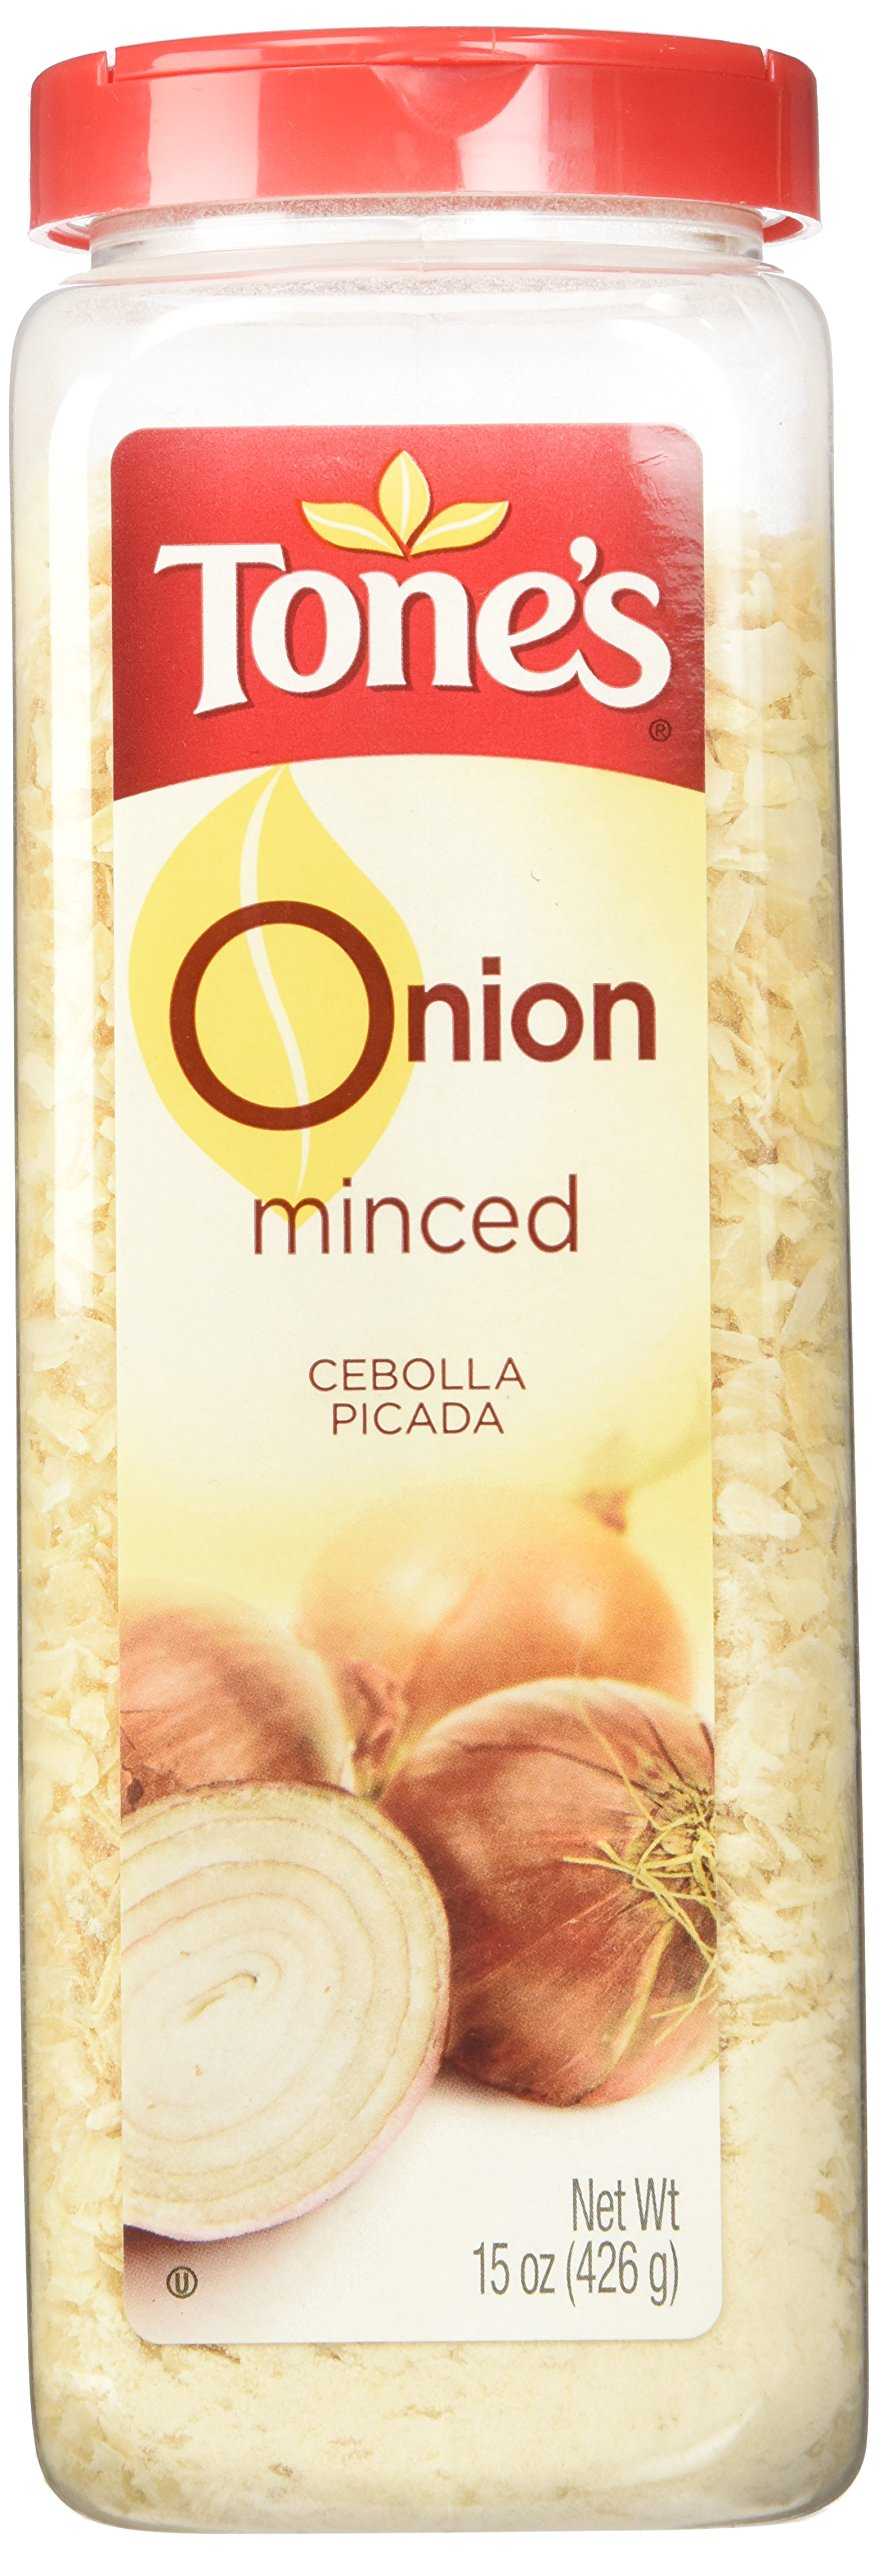 Tone's Minced Onion - 15 oz shaker